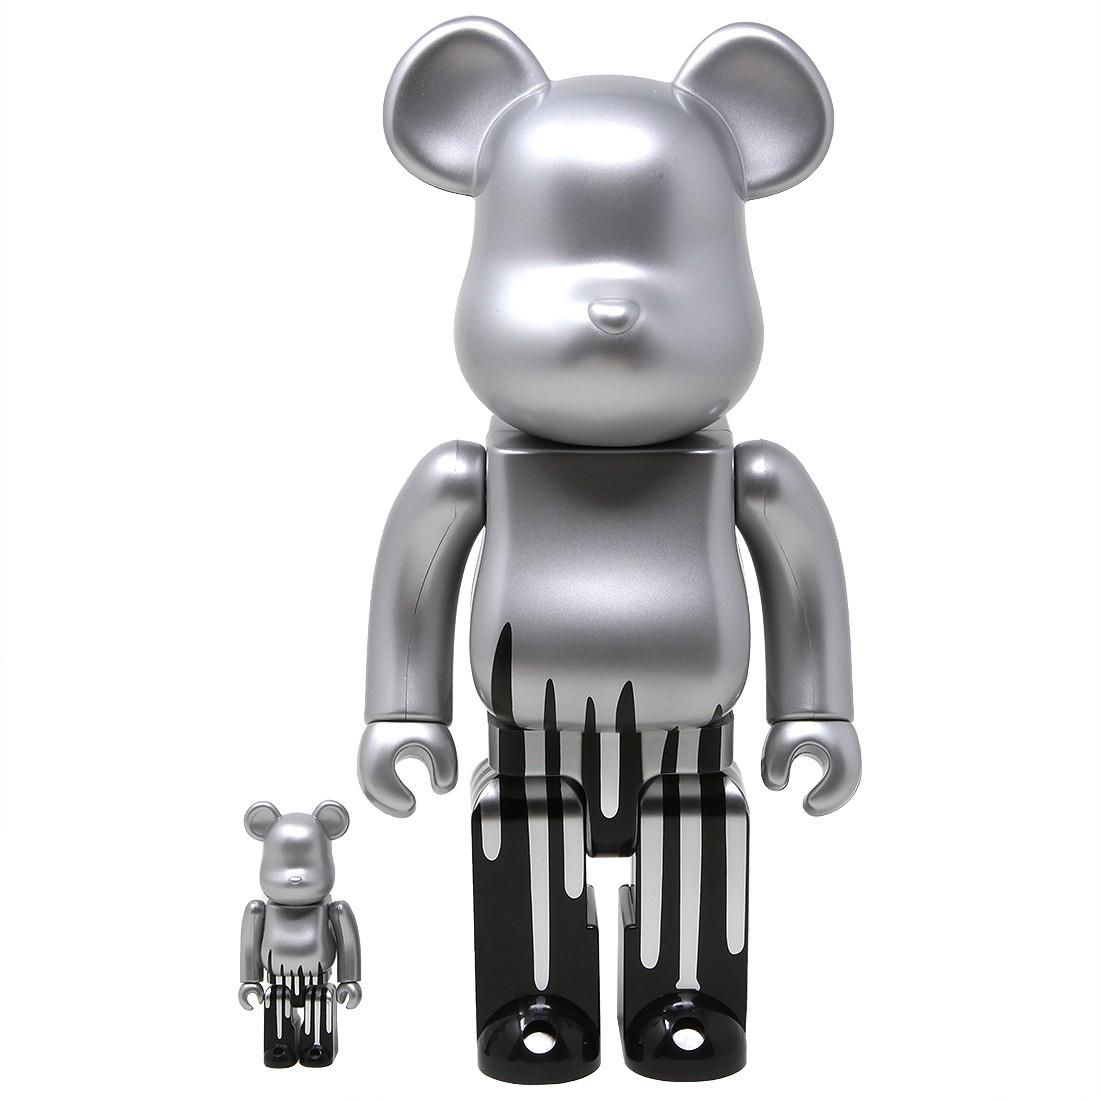 Medicom Krink 100% 400% Bearbrick Figure Set (silver)